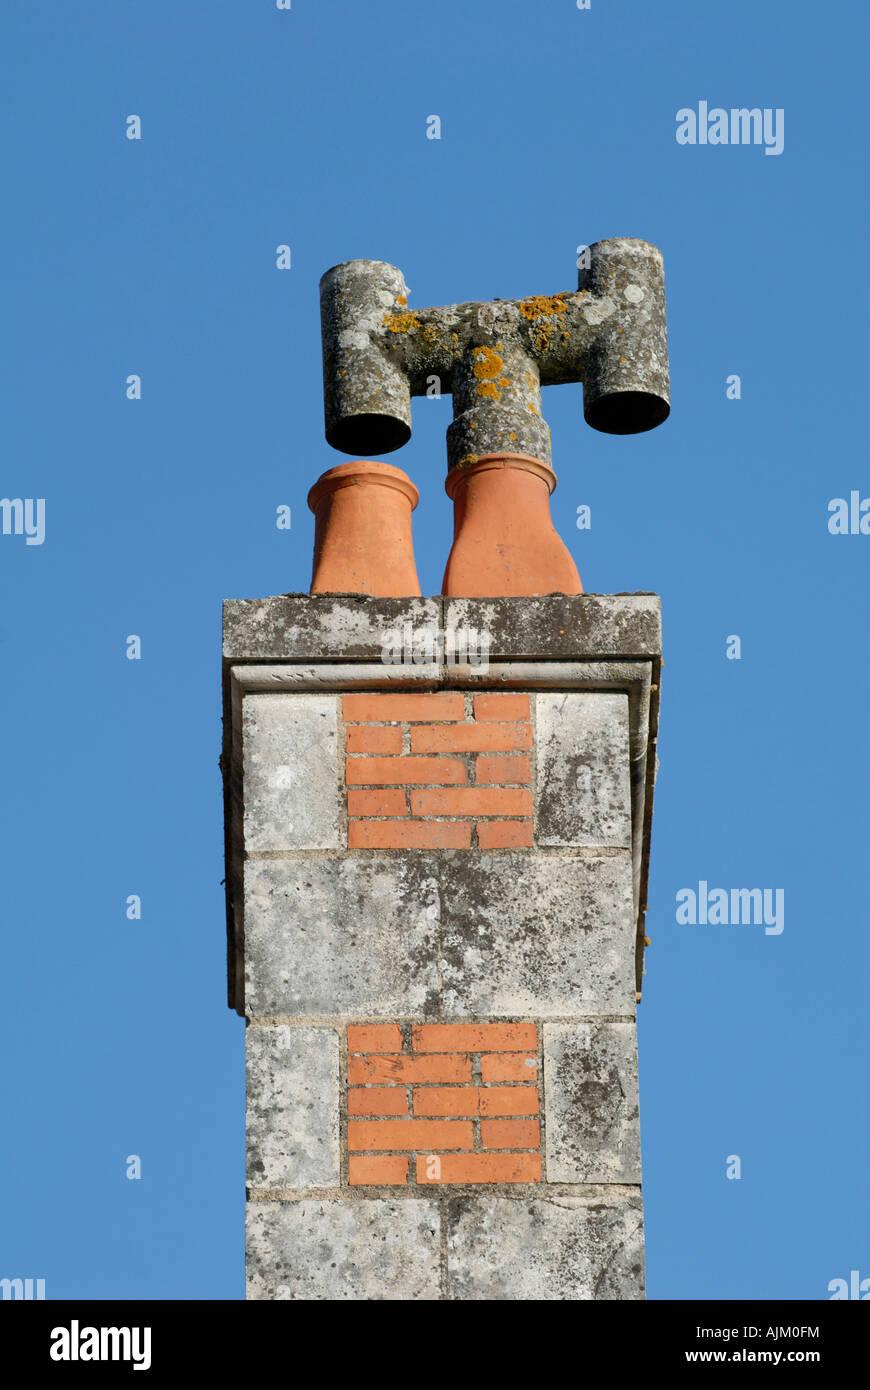 Chimney stack, Preuilly-sur-Claise, Indre-et-Loire, France. - Stock Image